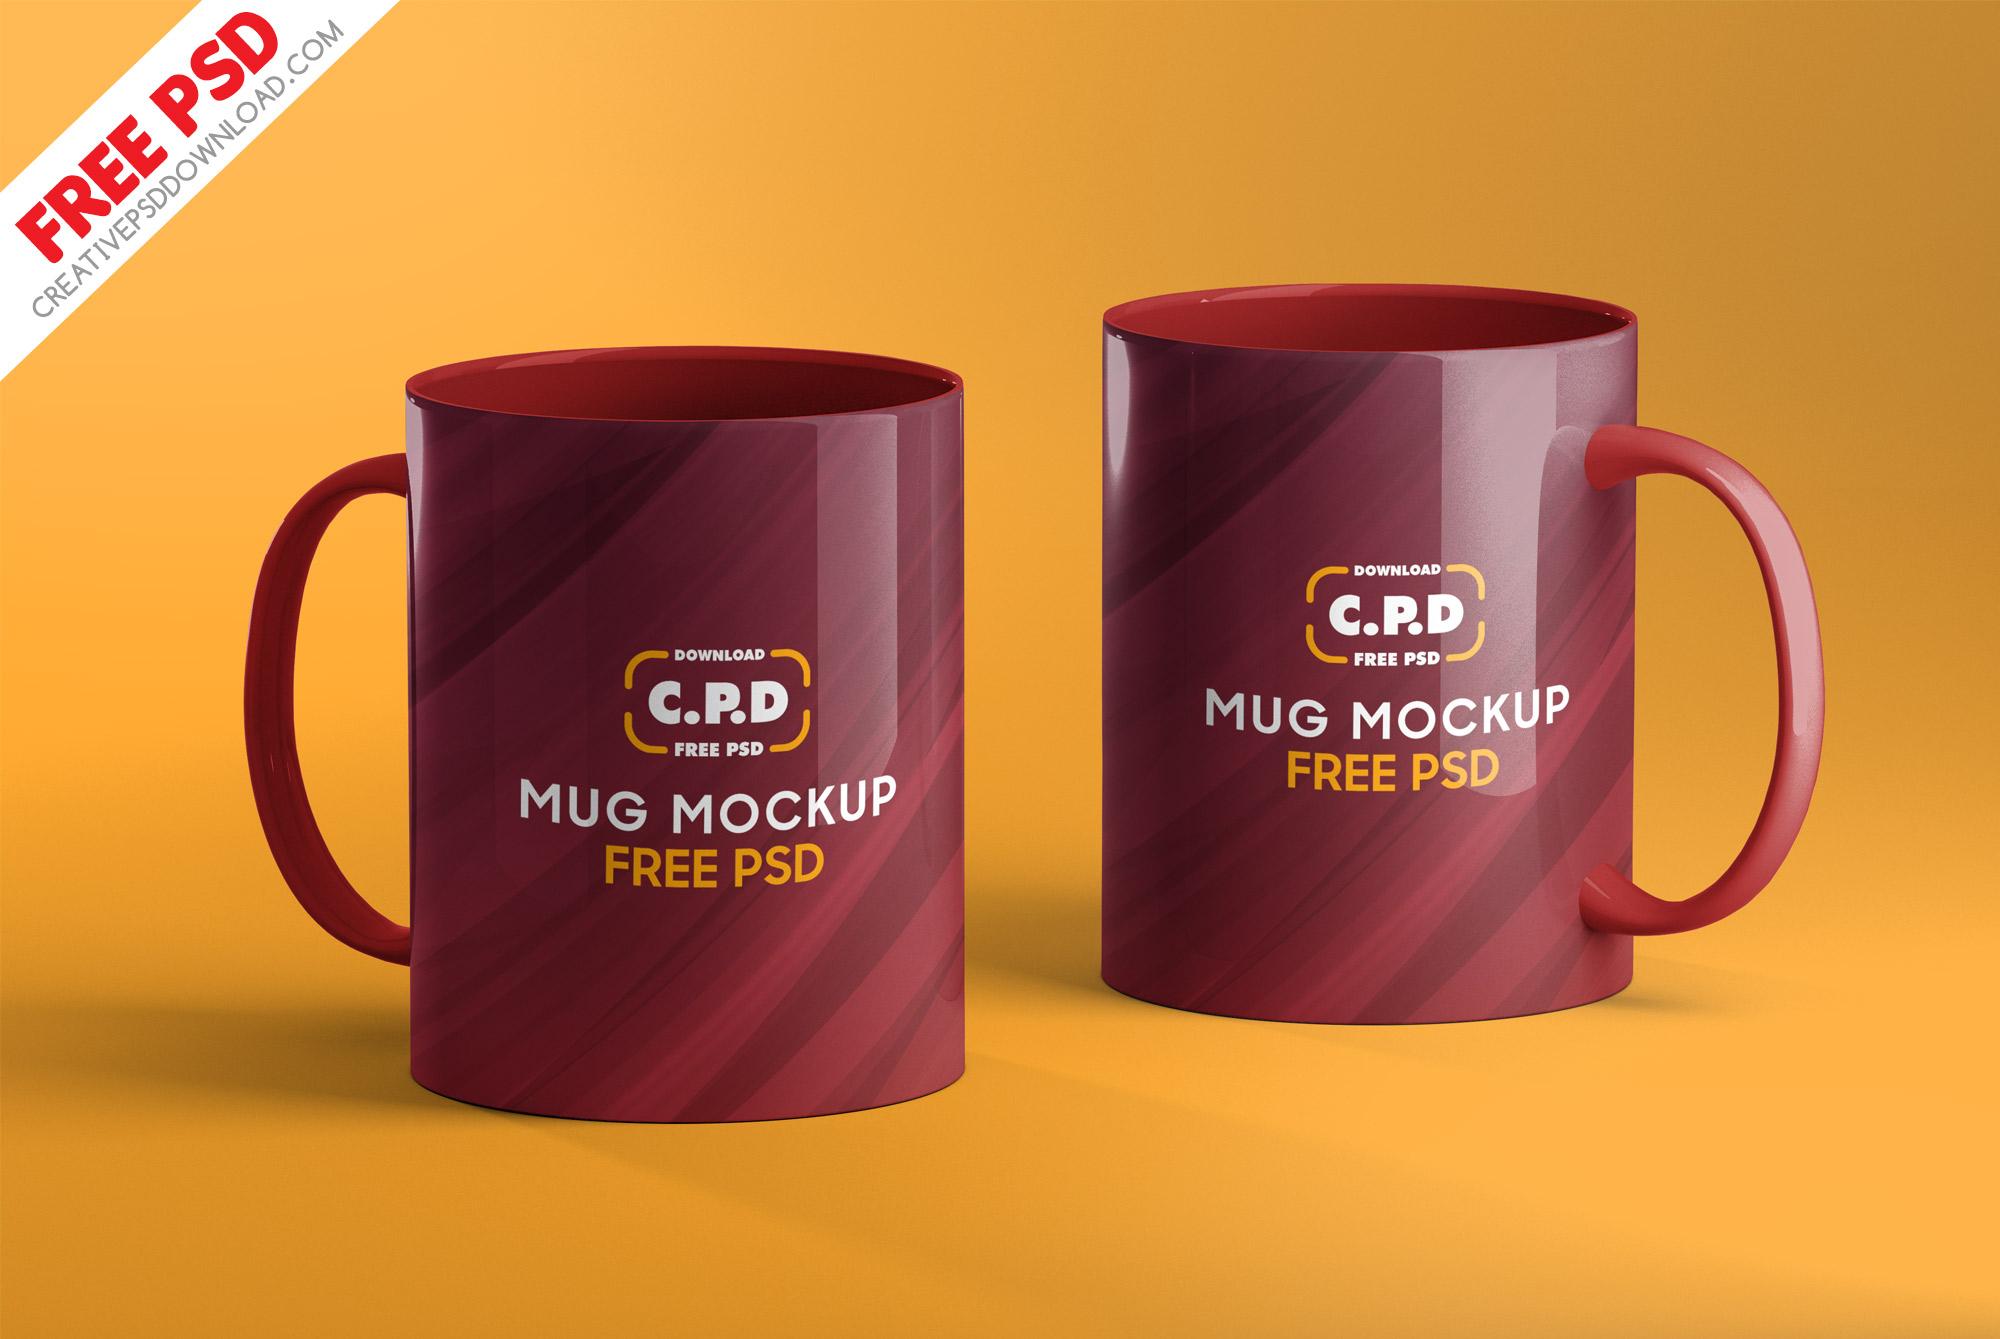 Mug Mockup Free PSD [3 Mug Mockups]